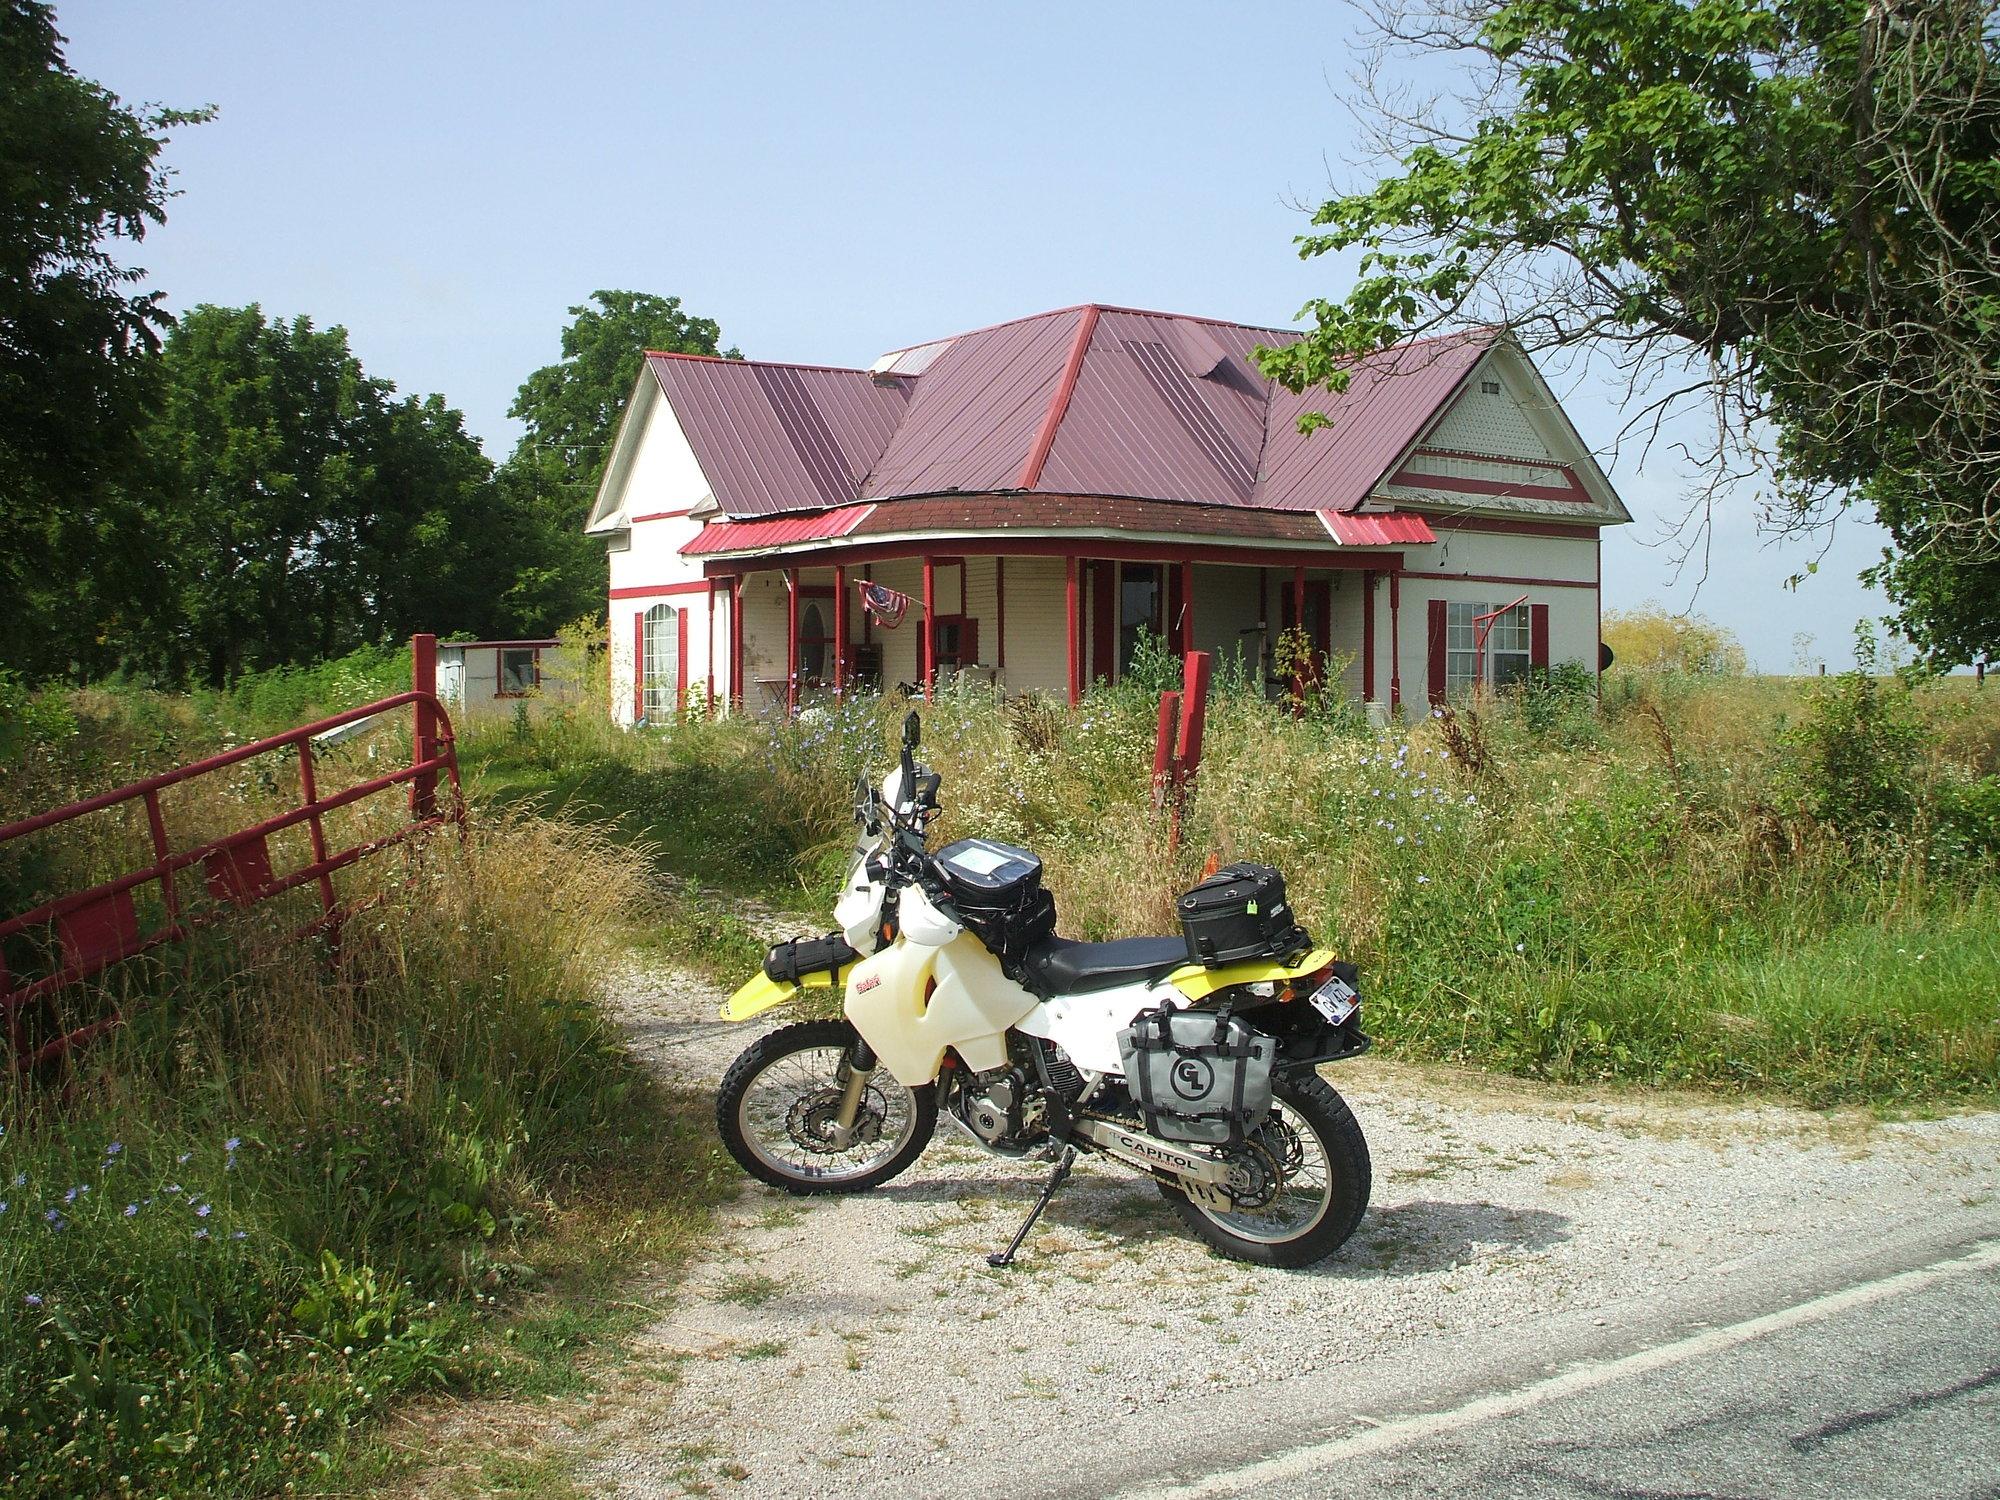 Abandoned House #3 Lawrence County Rt 66 1 6-28-2020.JPG